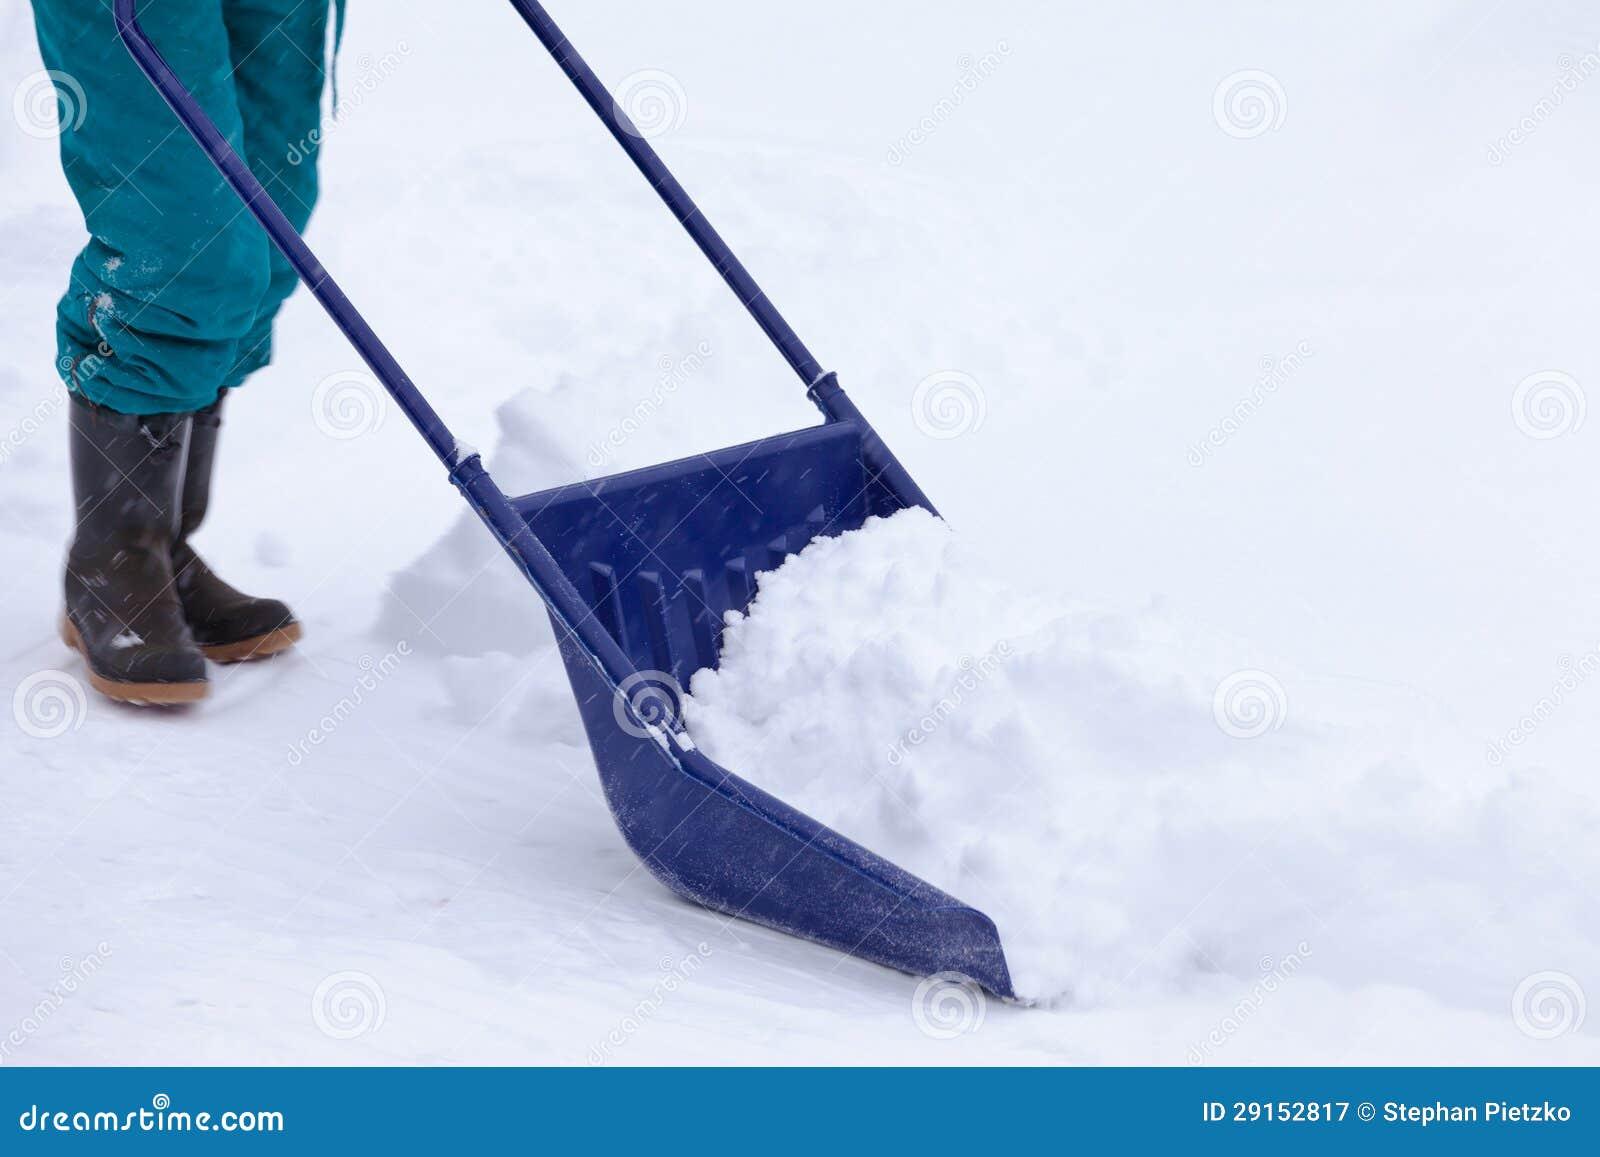 Snow Scoop Snow Shovel